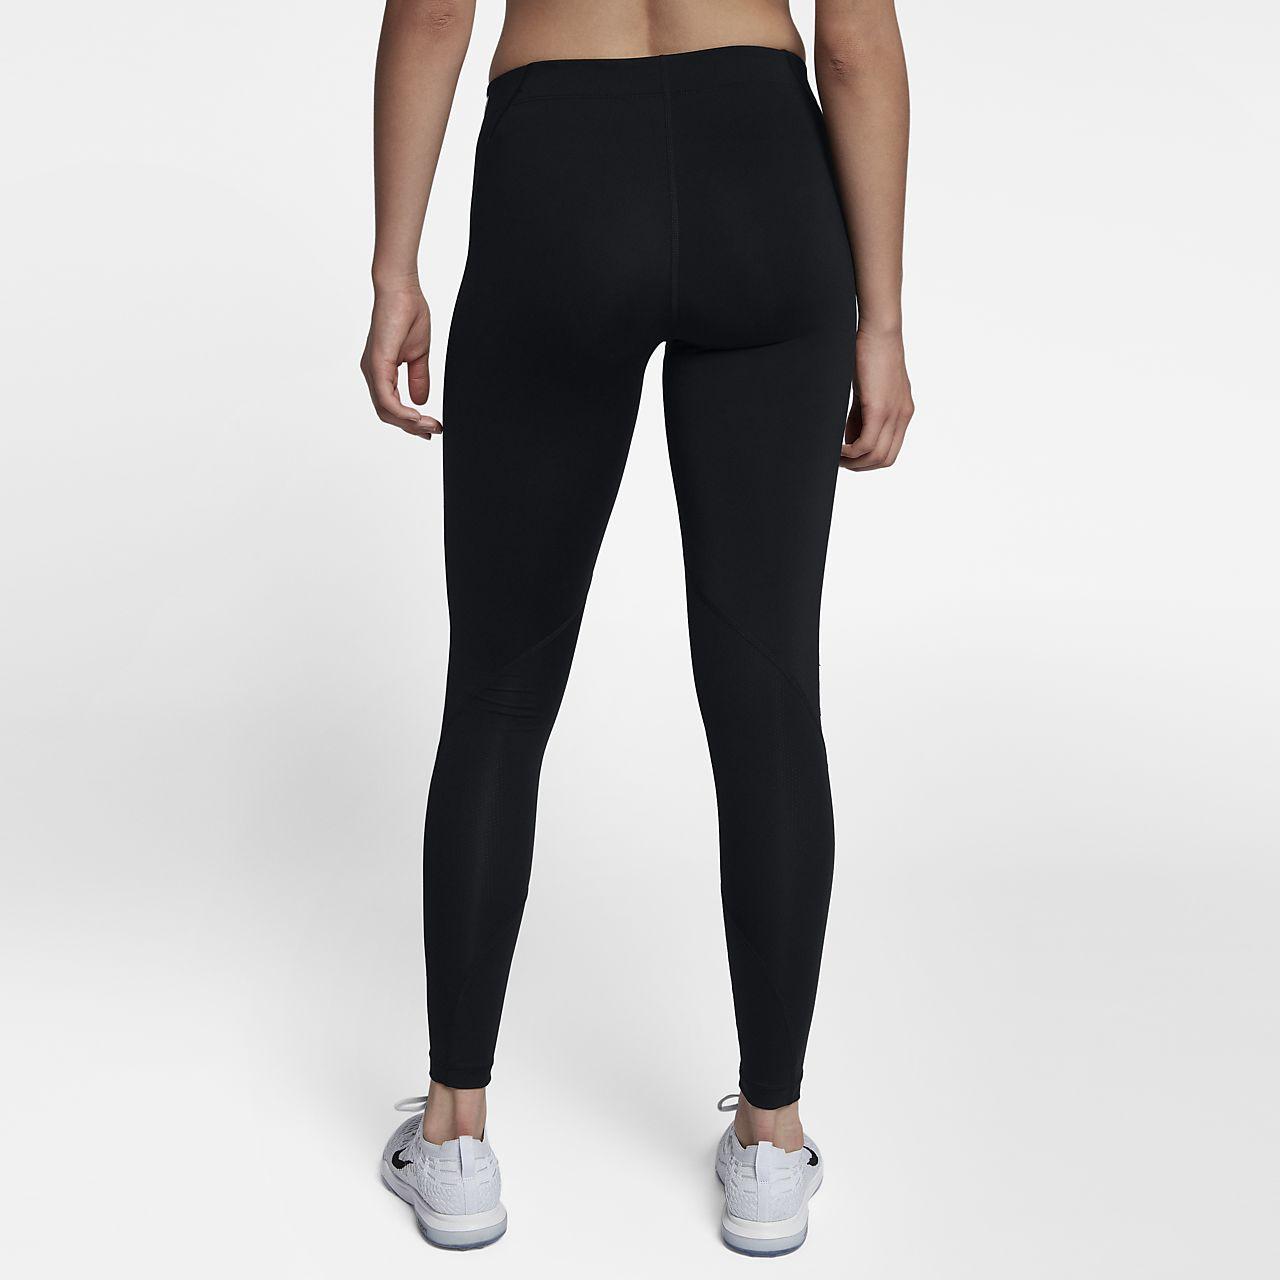 9af4ef0bfe9 Nike Pro Women s Mid-Rise Training Tights. Nike.com AU